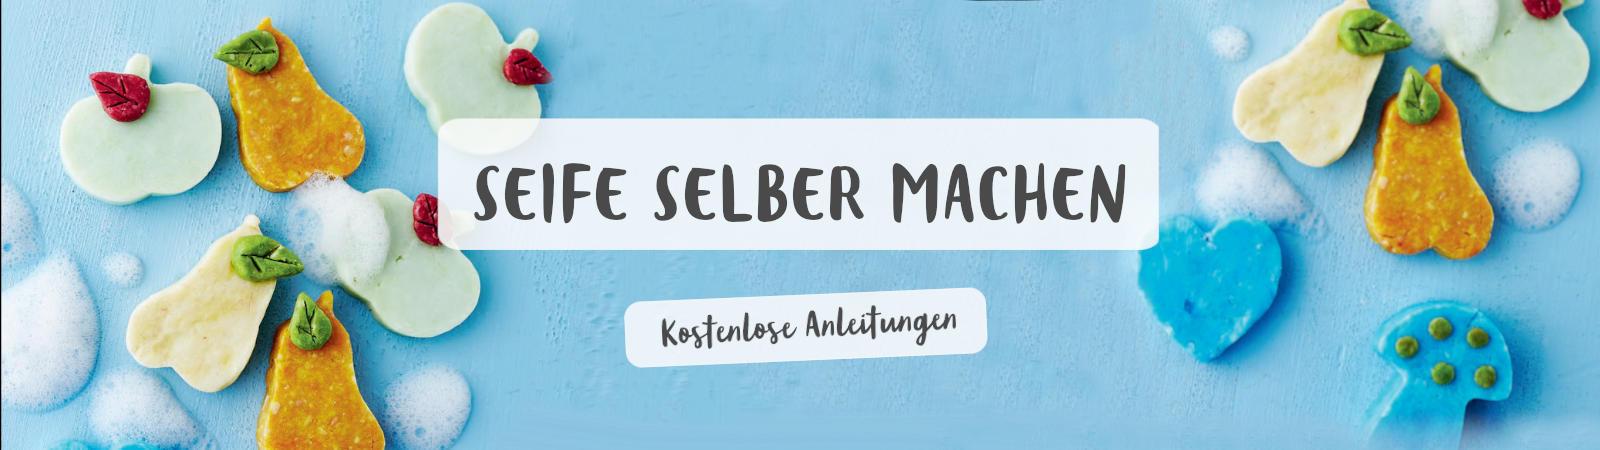 Seife_selber_machen_Banner